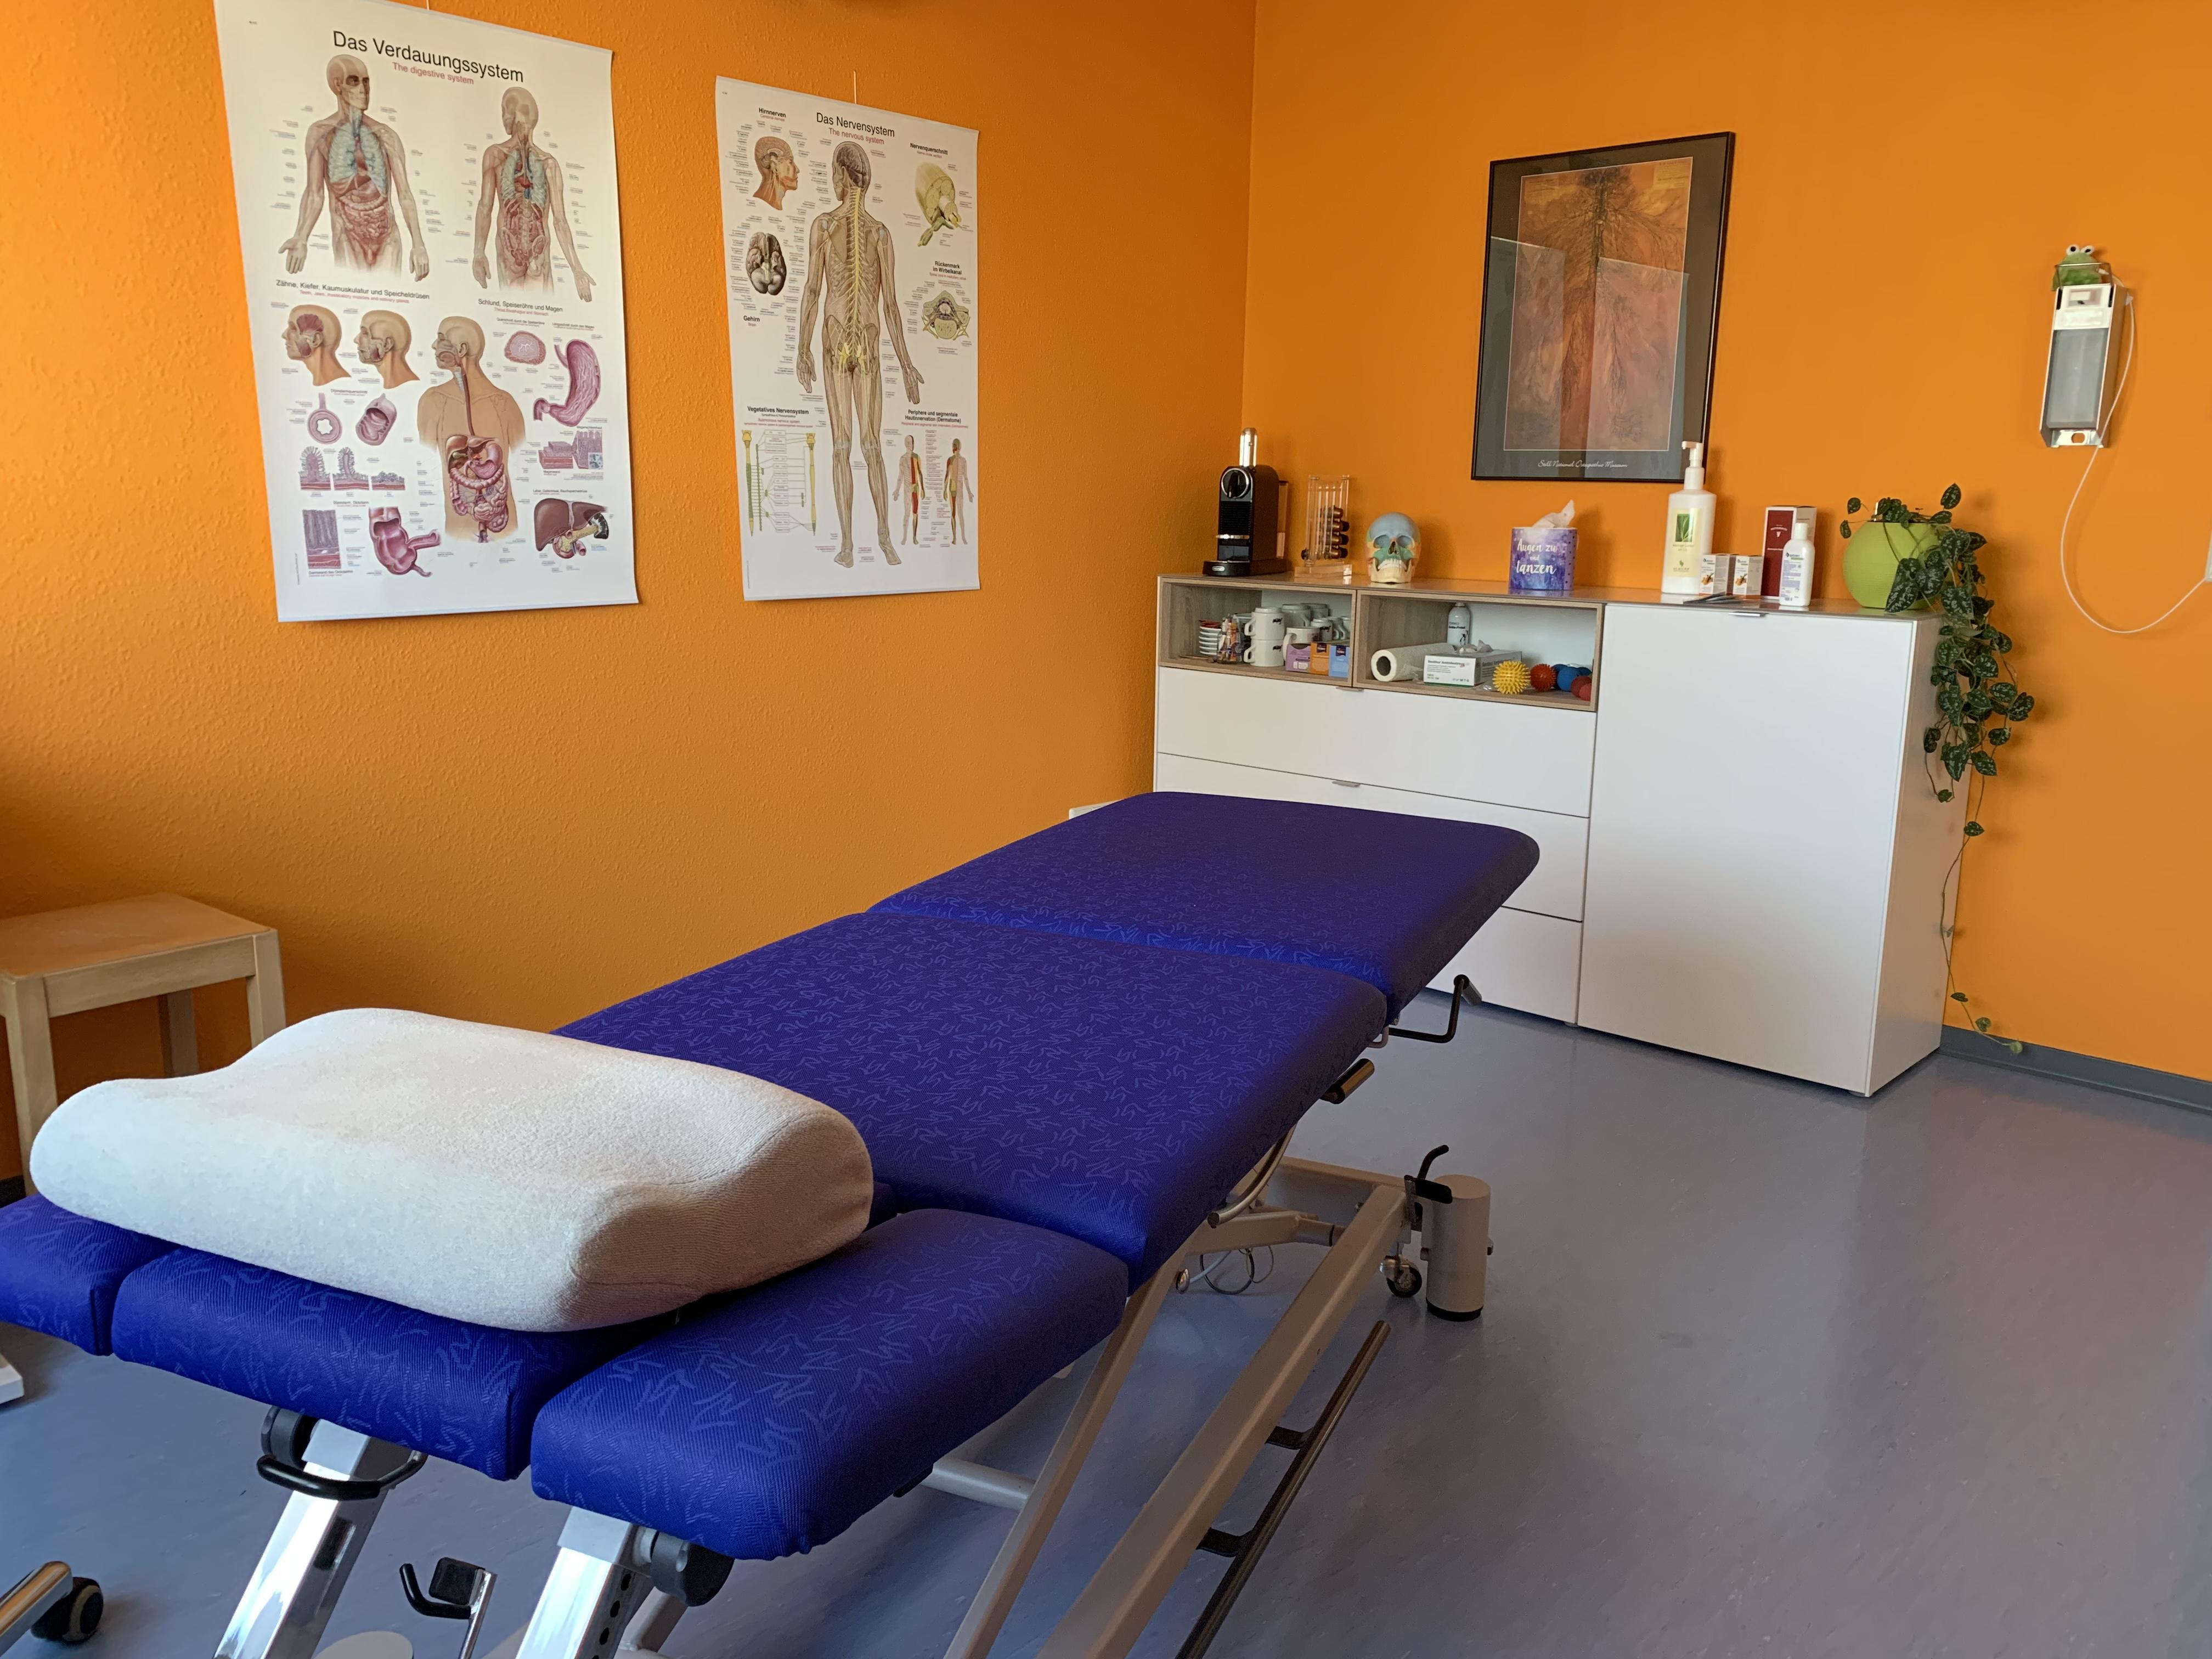 Behandlungsraum Physiotherapie / Manuelle Therapie Praxisgemeinschaft impulse Rastatt